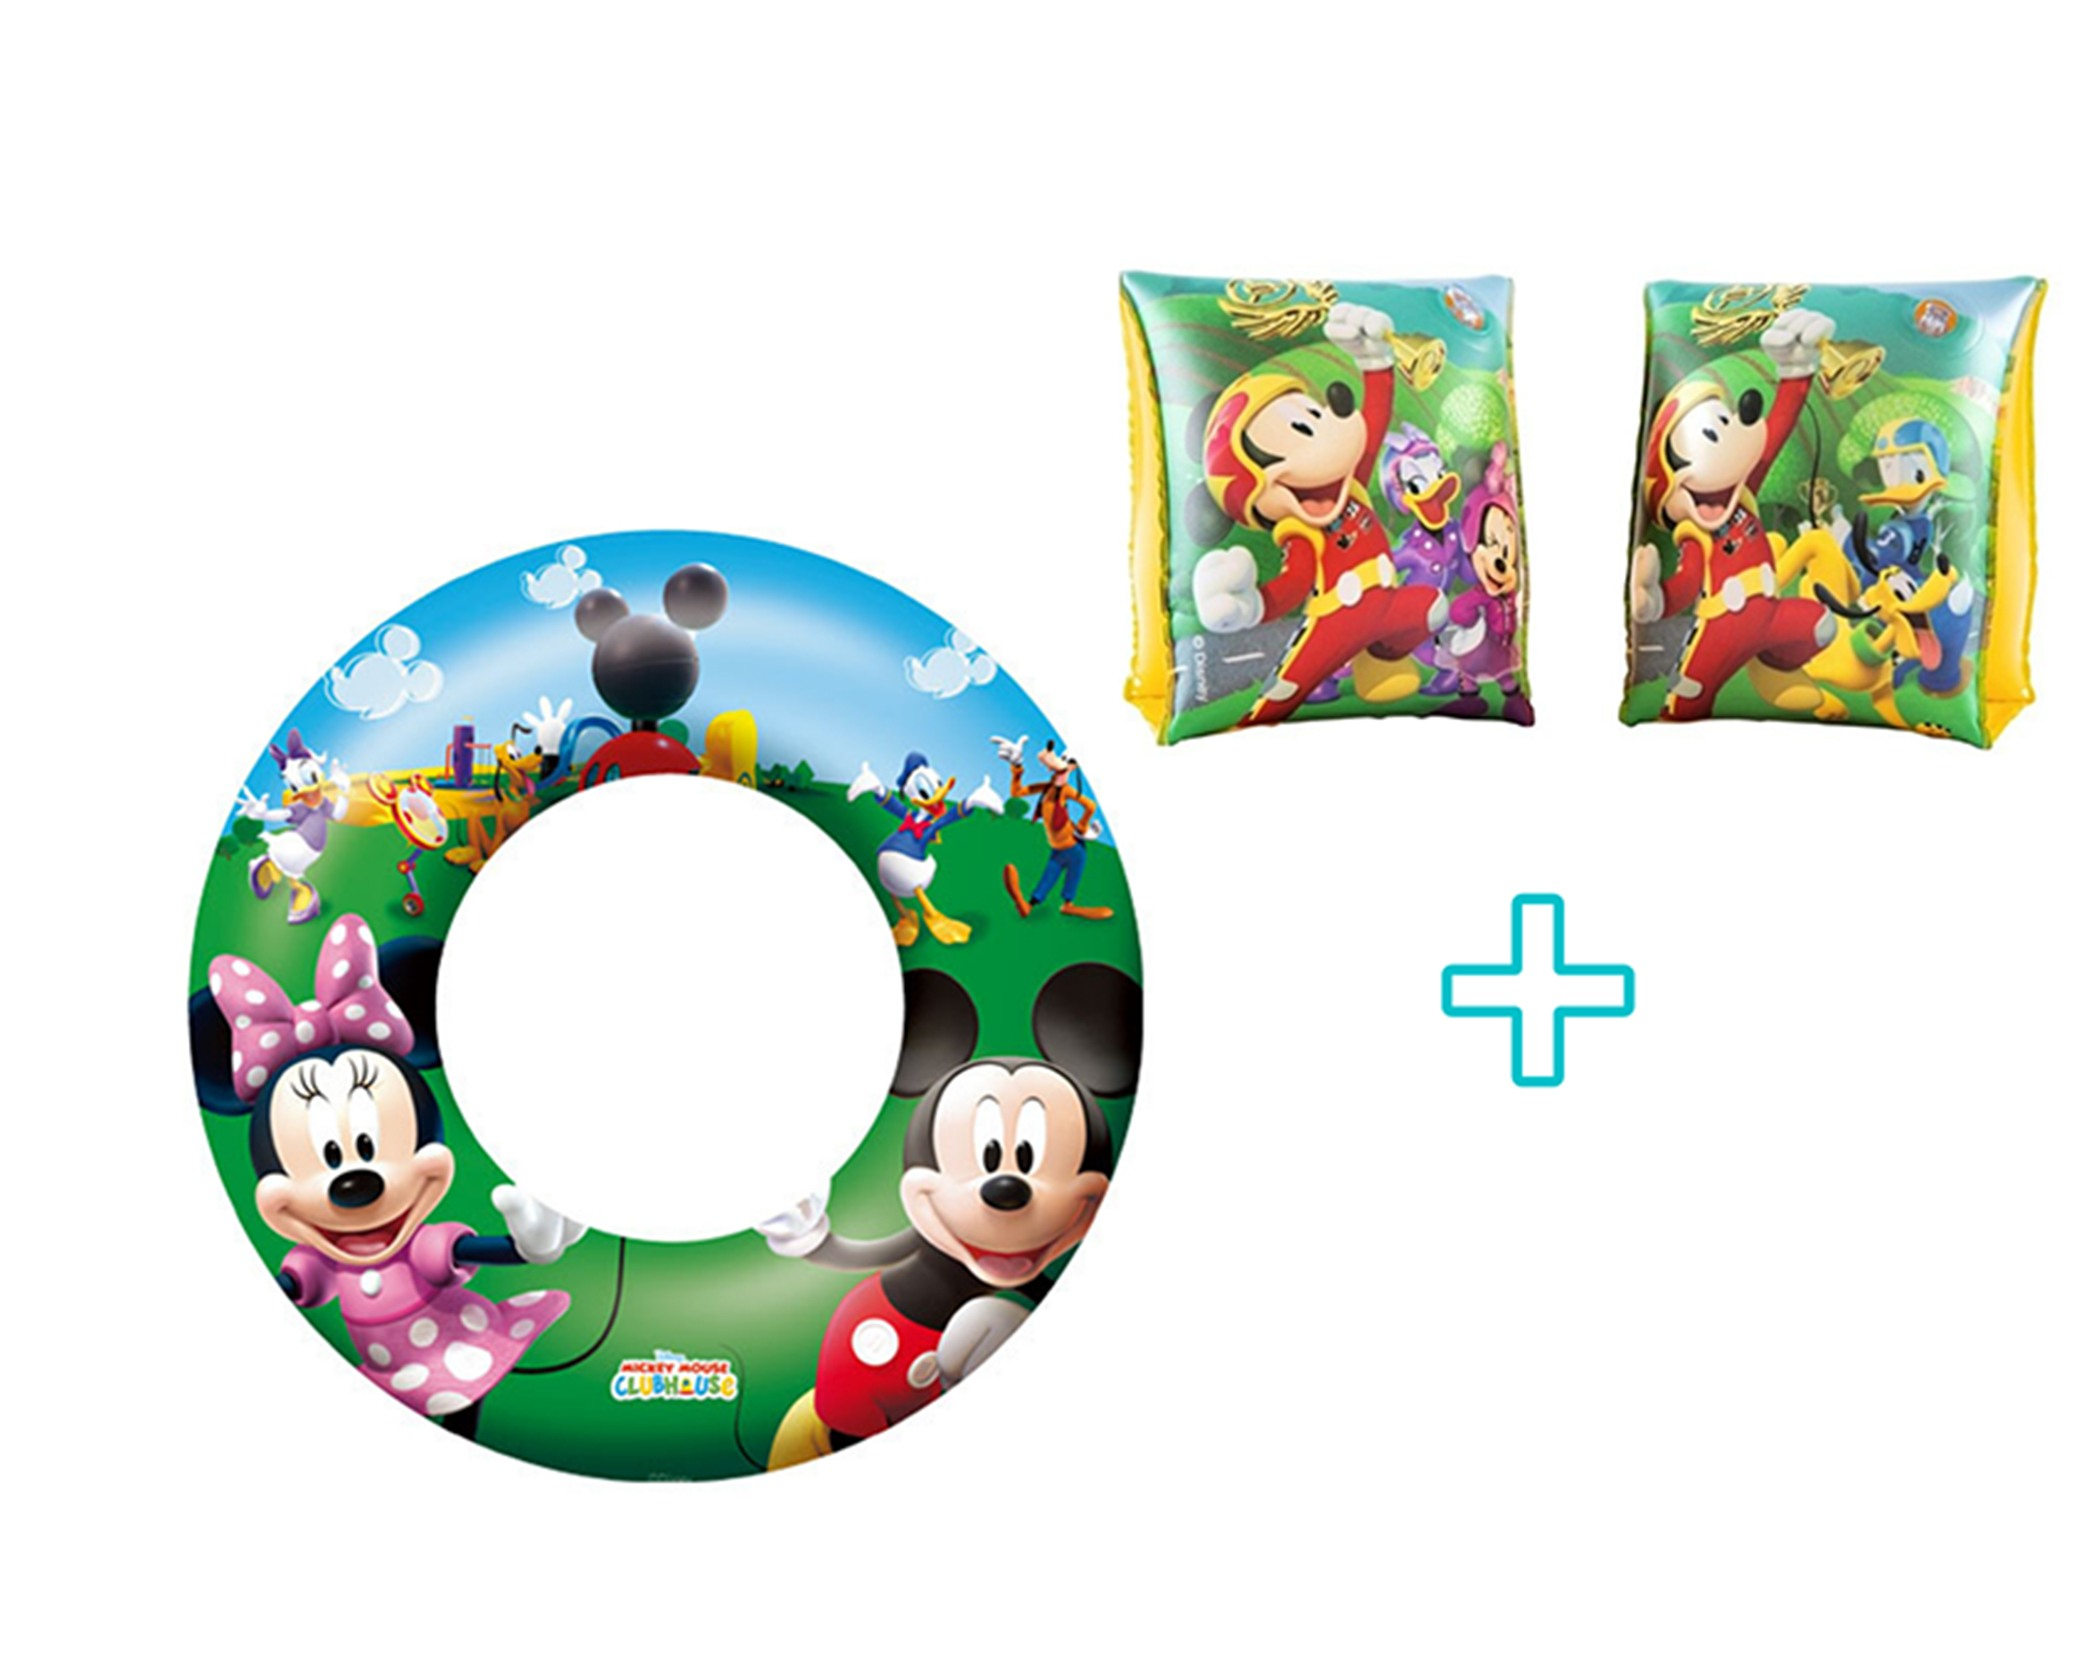 Disney Mickey Mouse kolut i rukavice